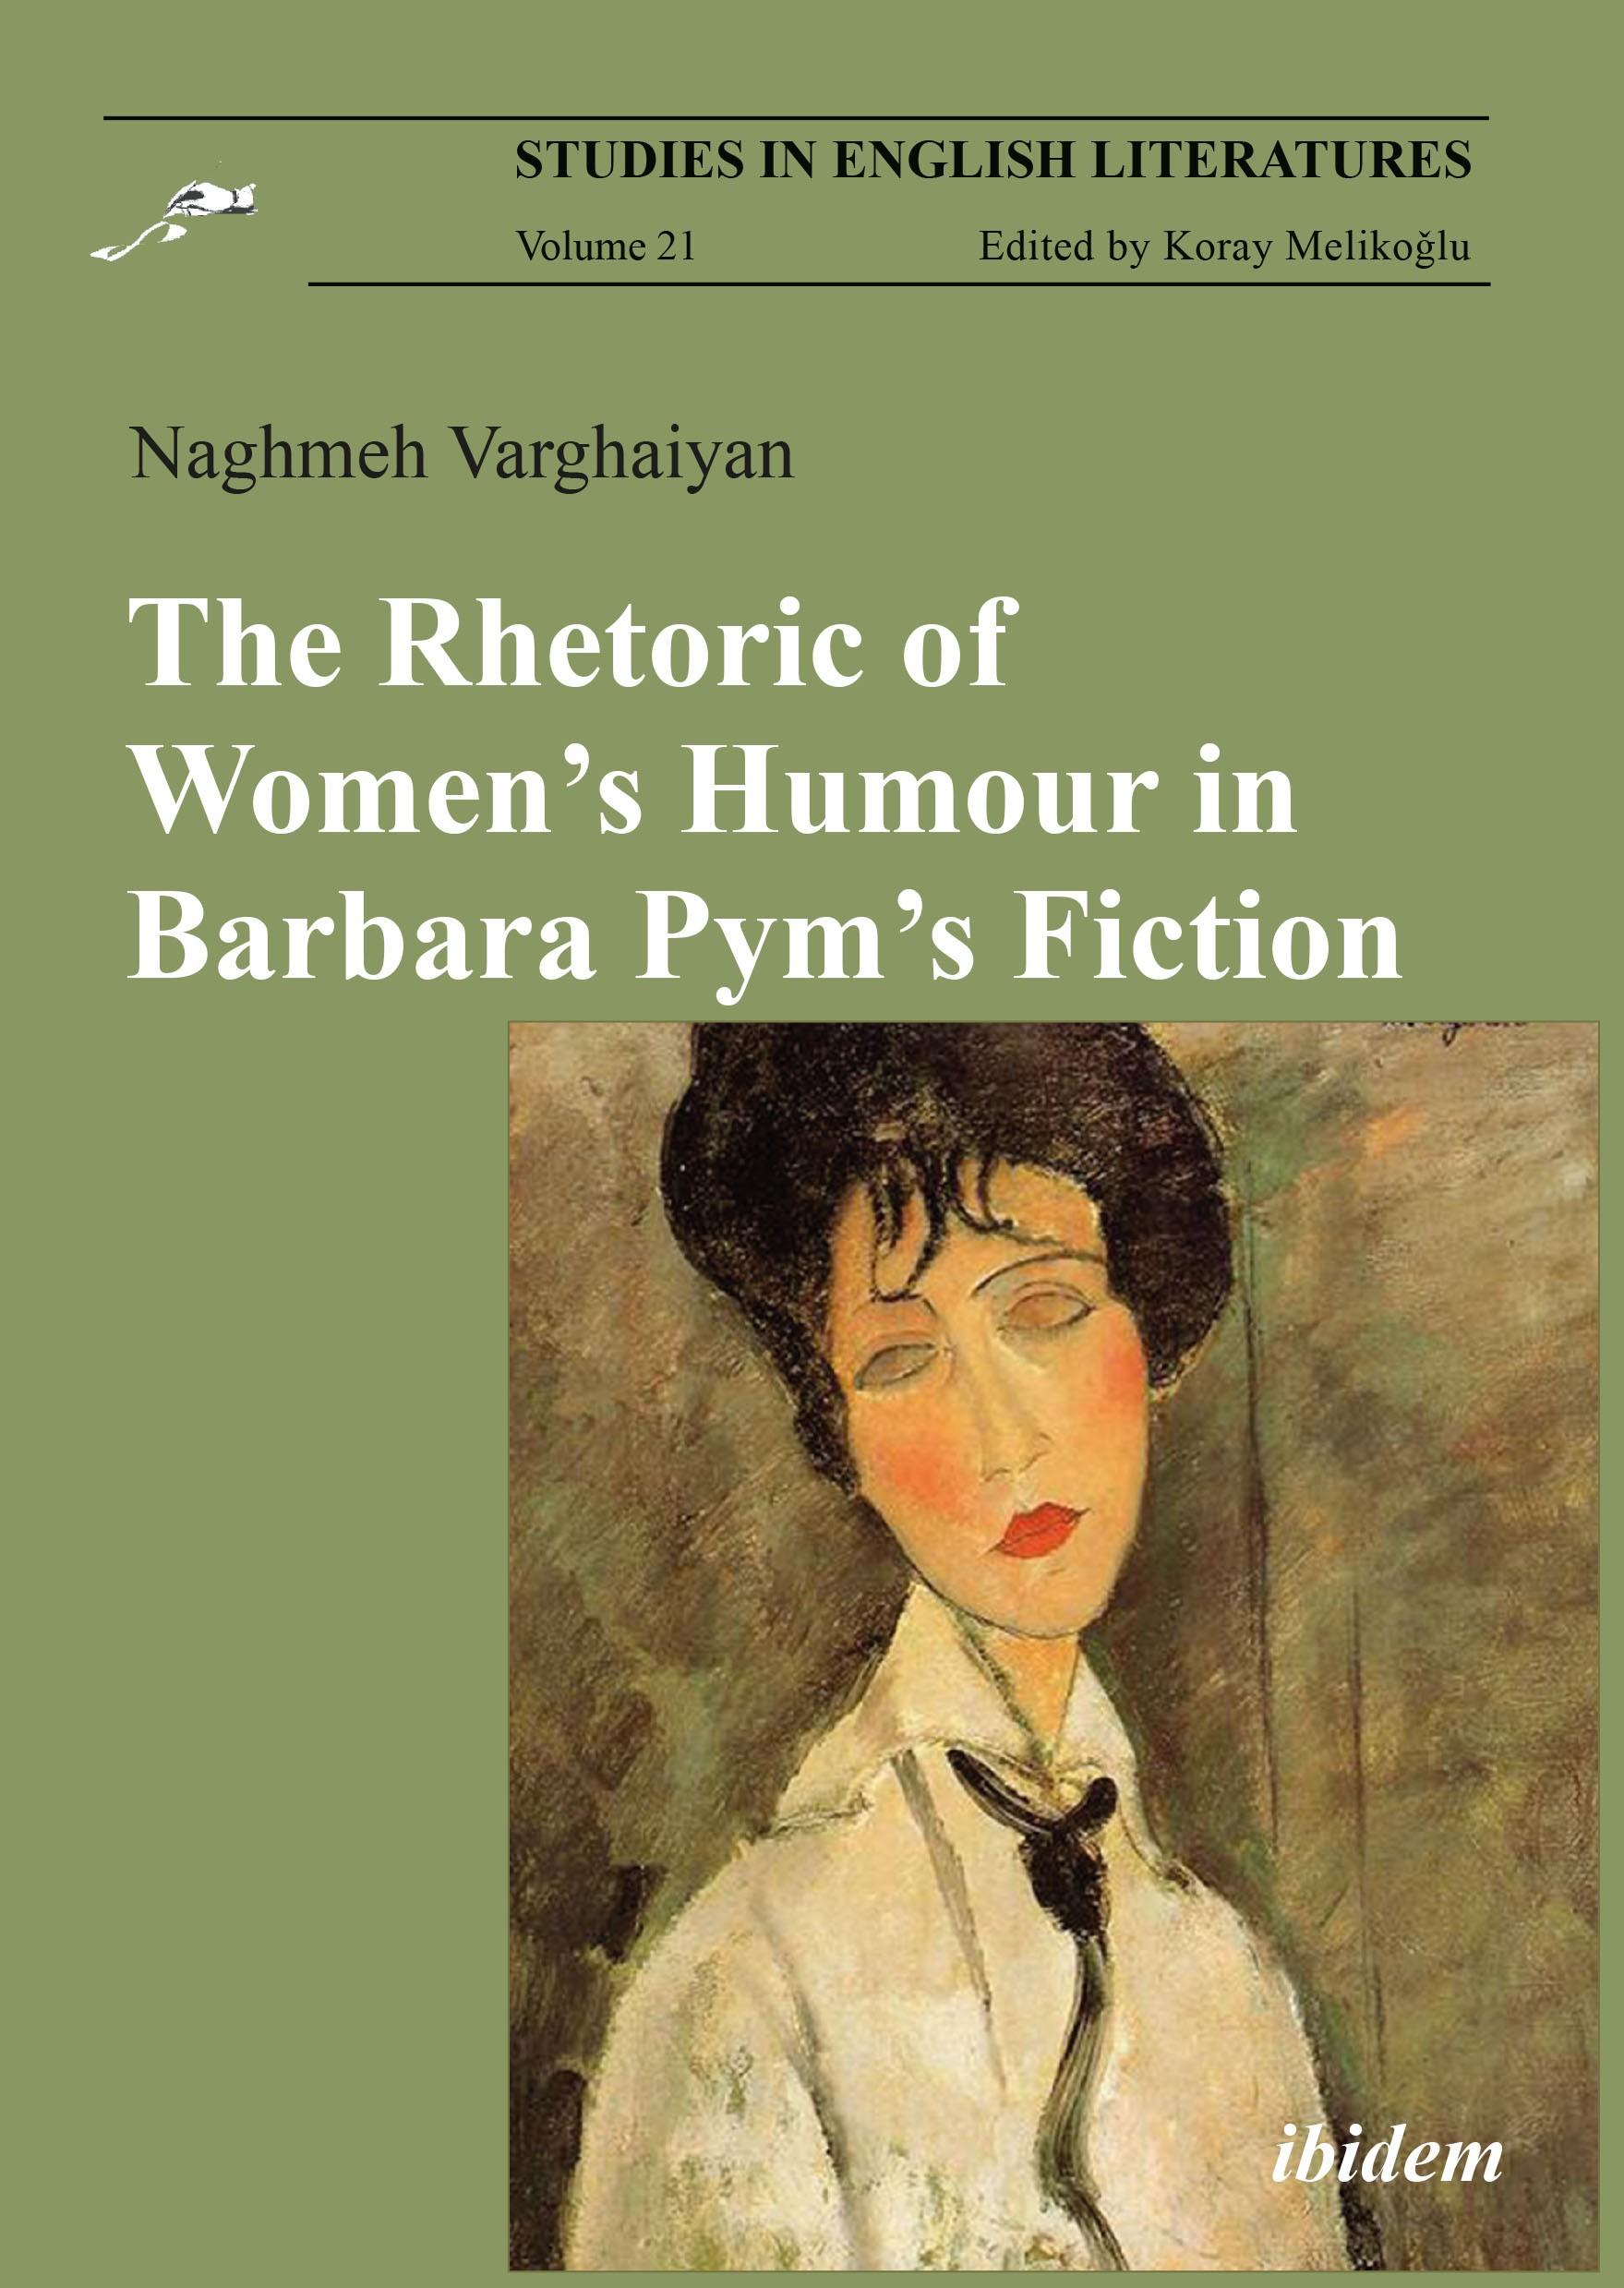 The Rhetoric of Women's Humour in Barbara Pym's Fiction